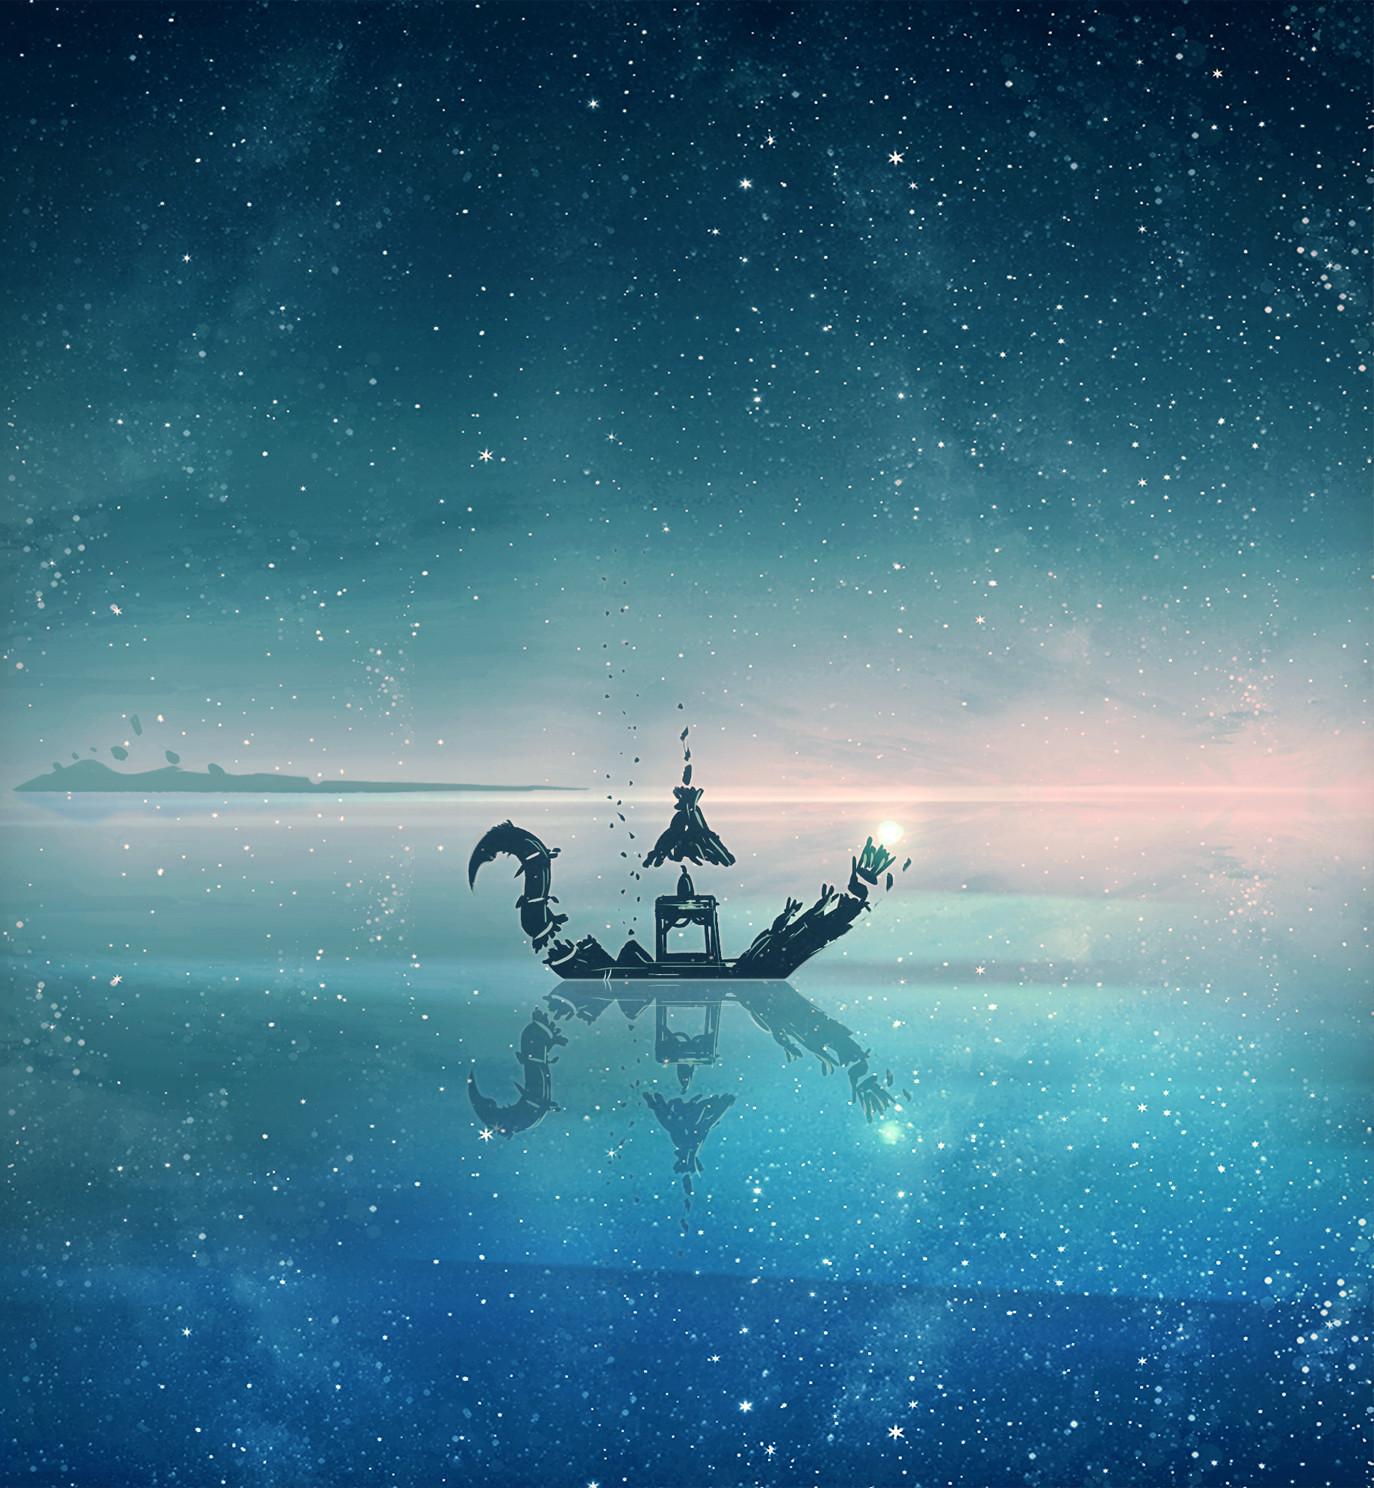 Christian benavides pescando en el mar dle universo